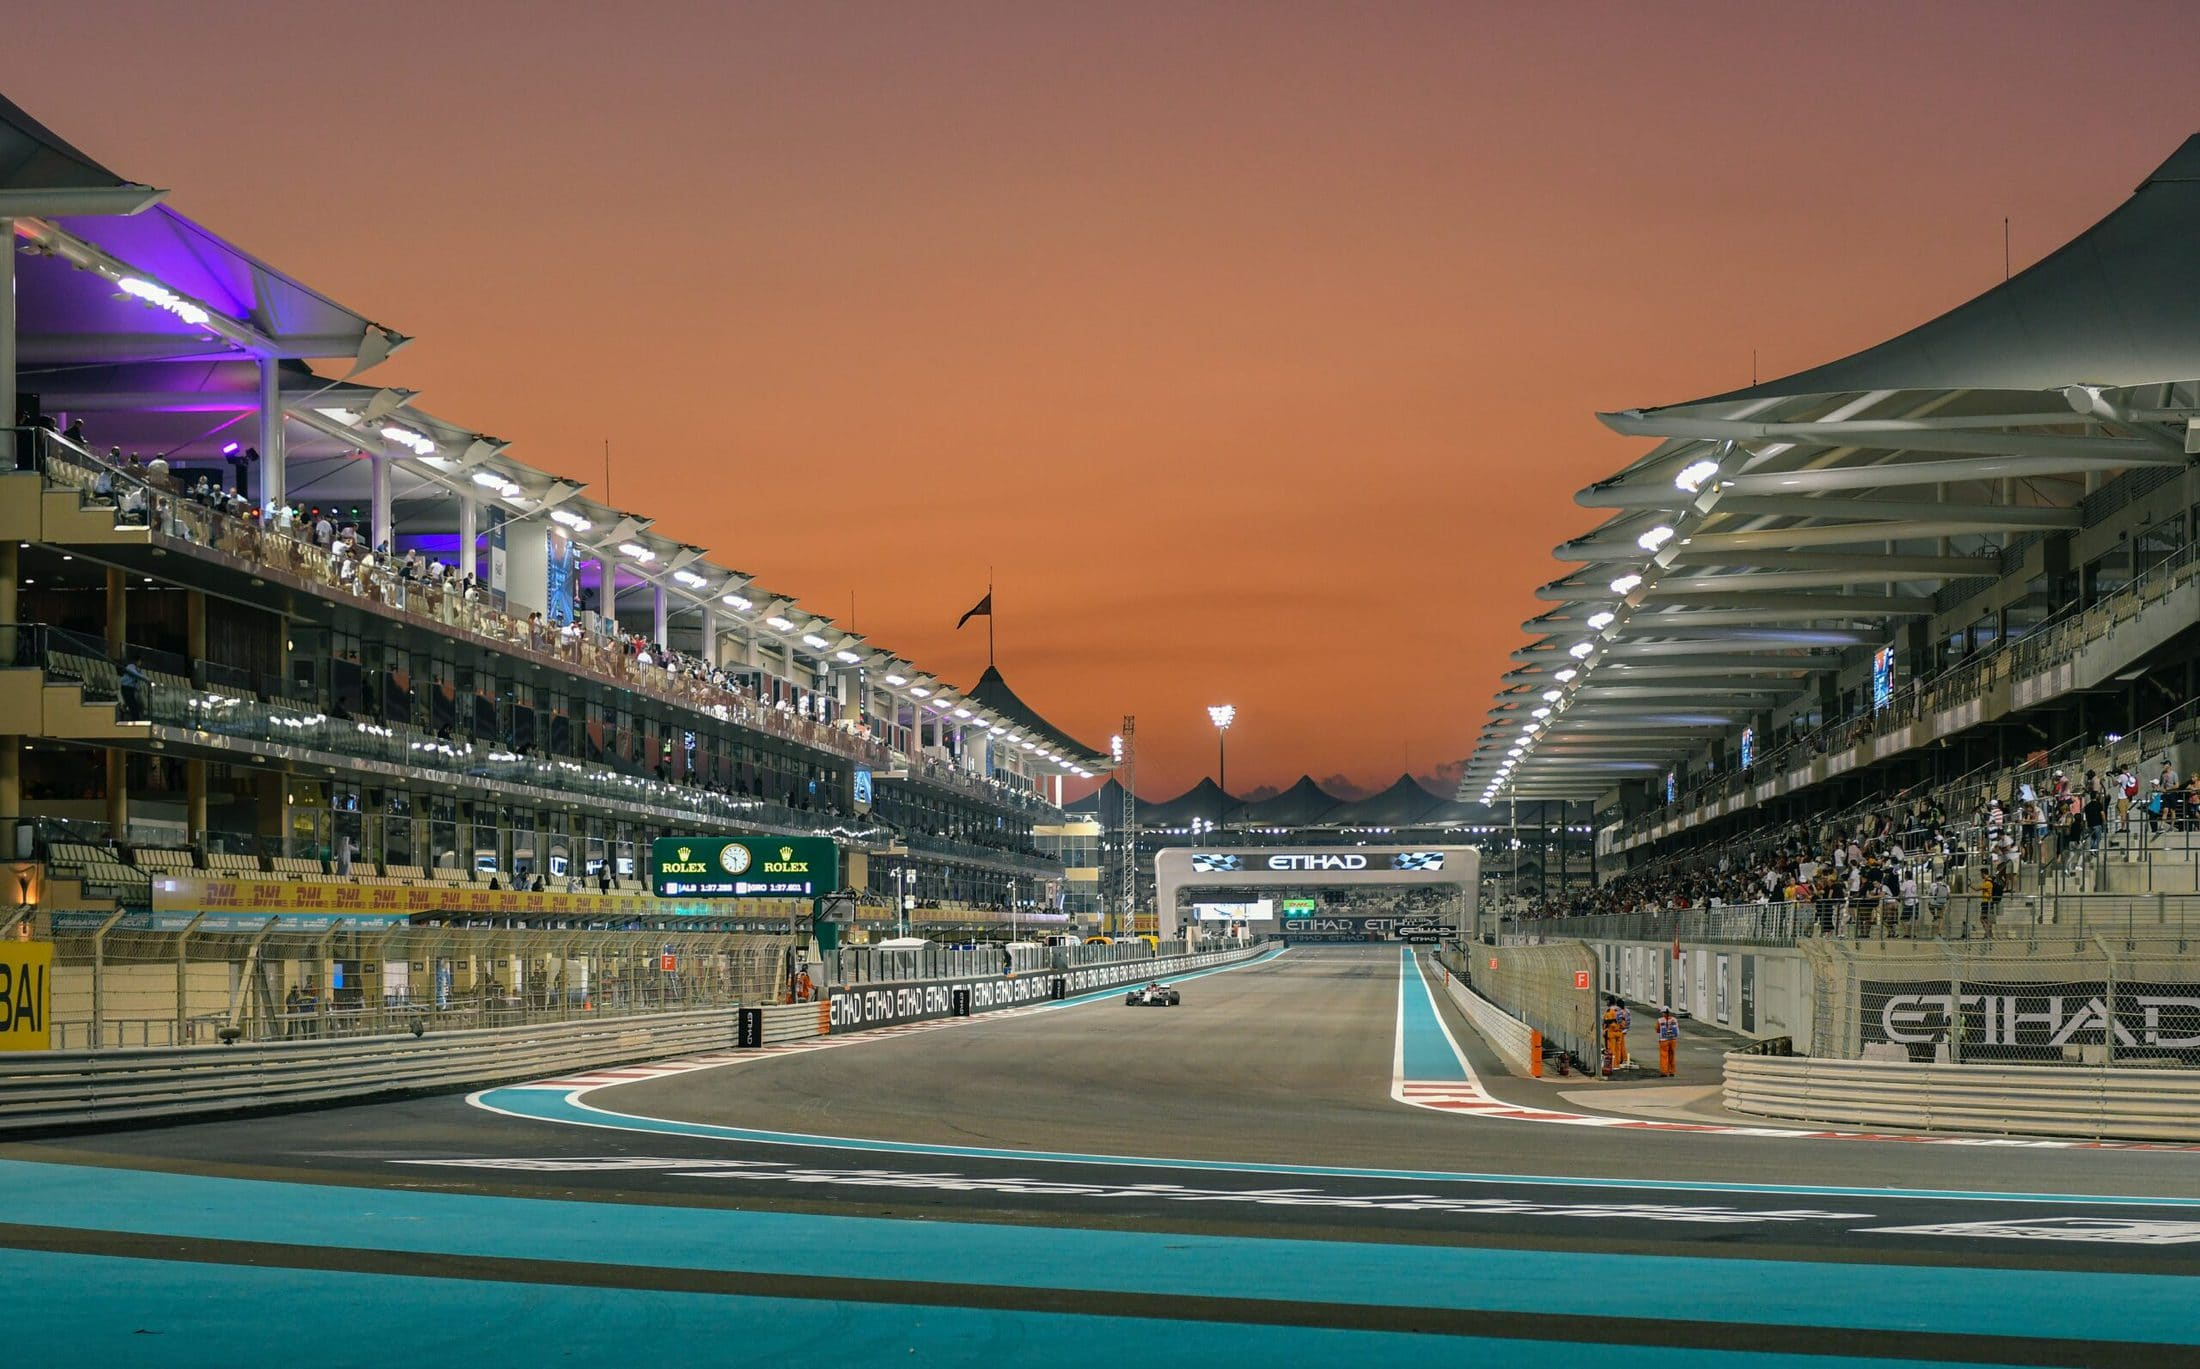 Abu Dhabi Grand Prix 2021 – 4-star Hotel Dubai – Yas Marina Circuit